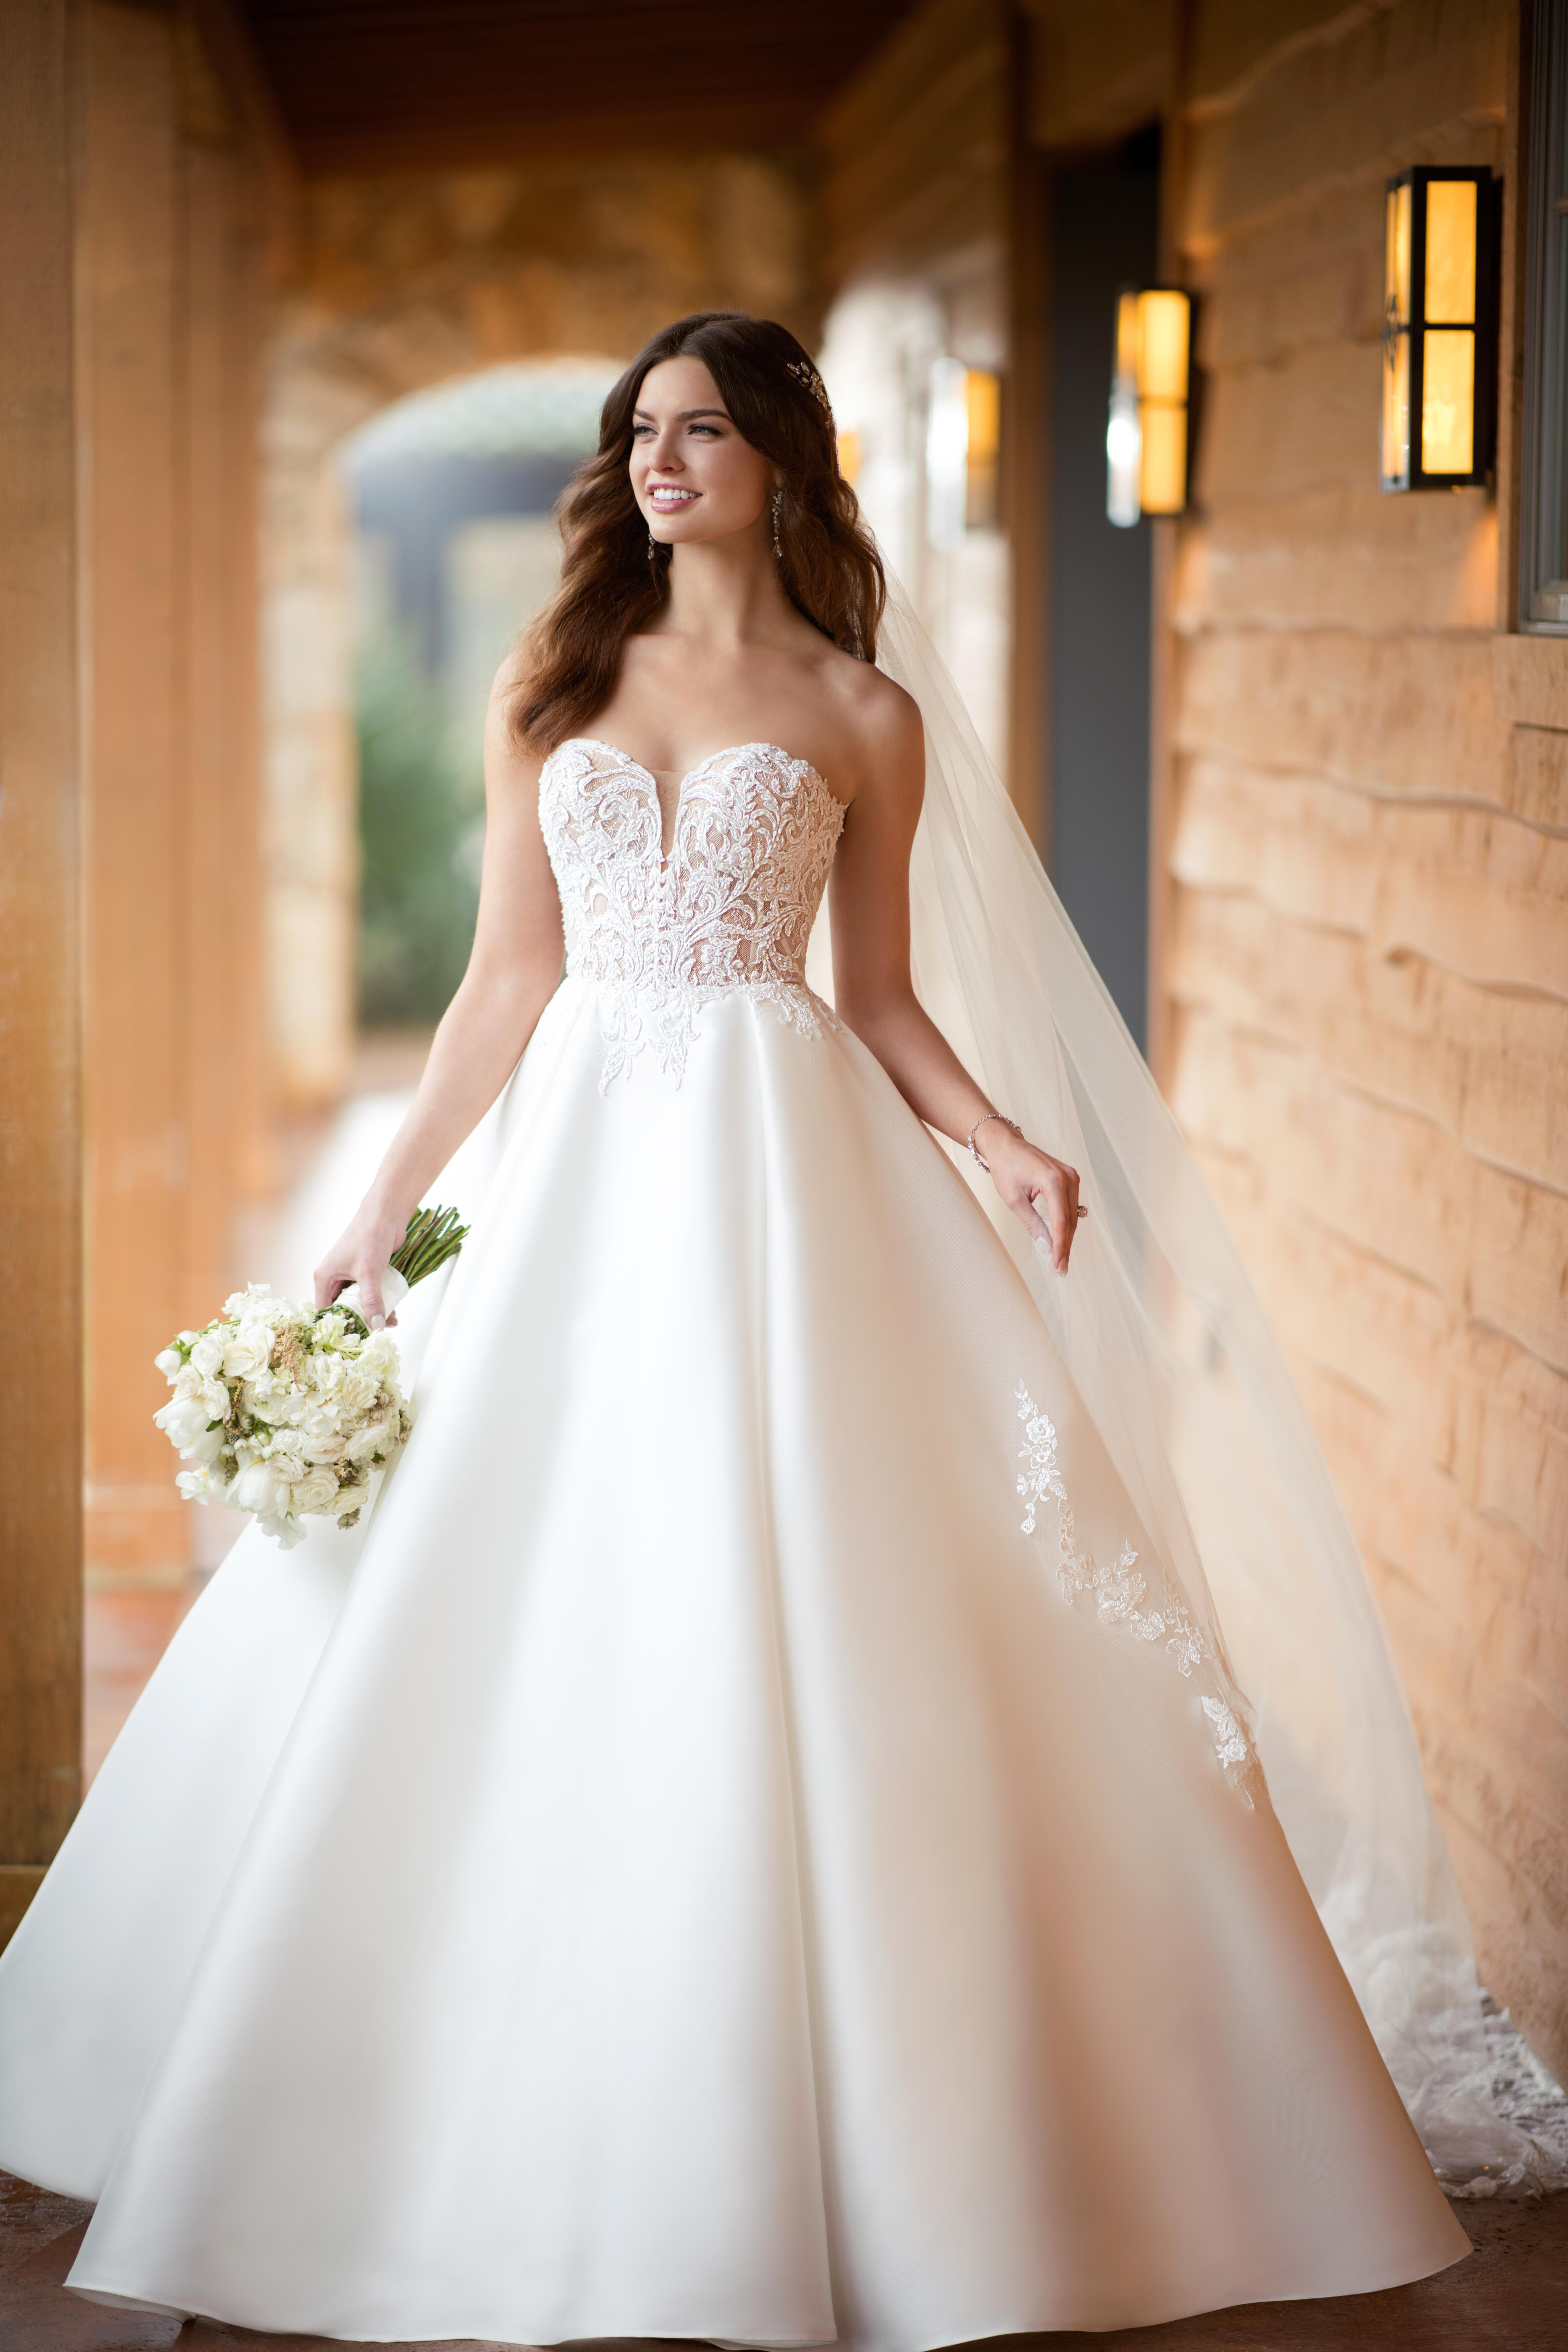 1e4596a6e3bb Mature Bride Sweetheart Wedding Dresses Australia Source · Essense of Australia  Wedding Gowns Bella Sposa Bridal Boutique